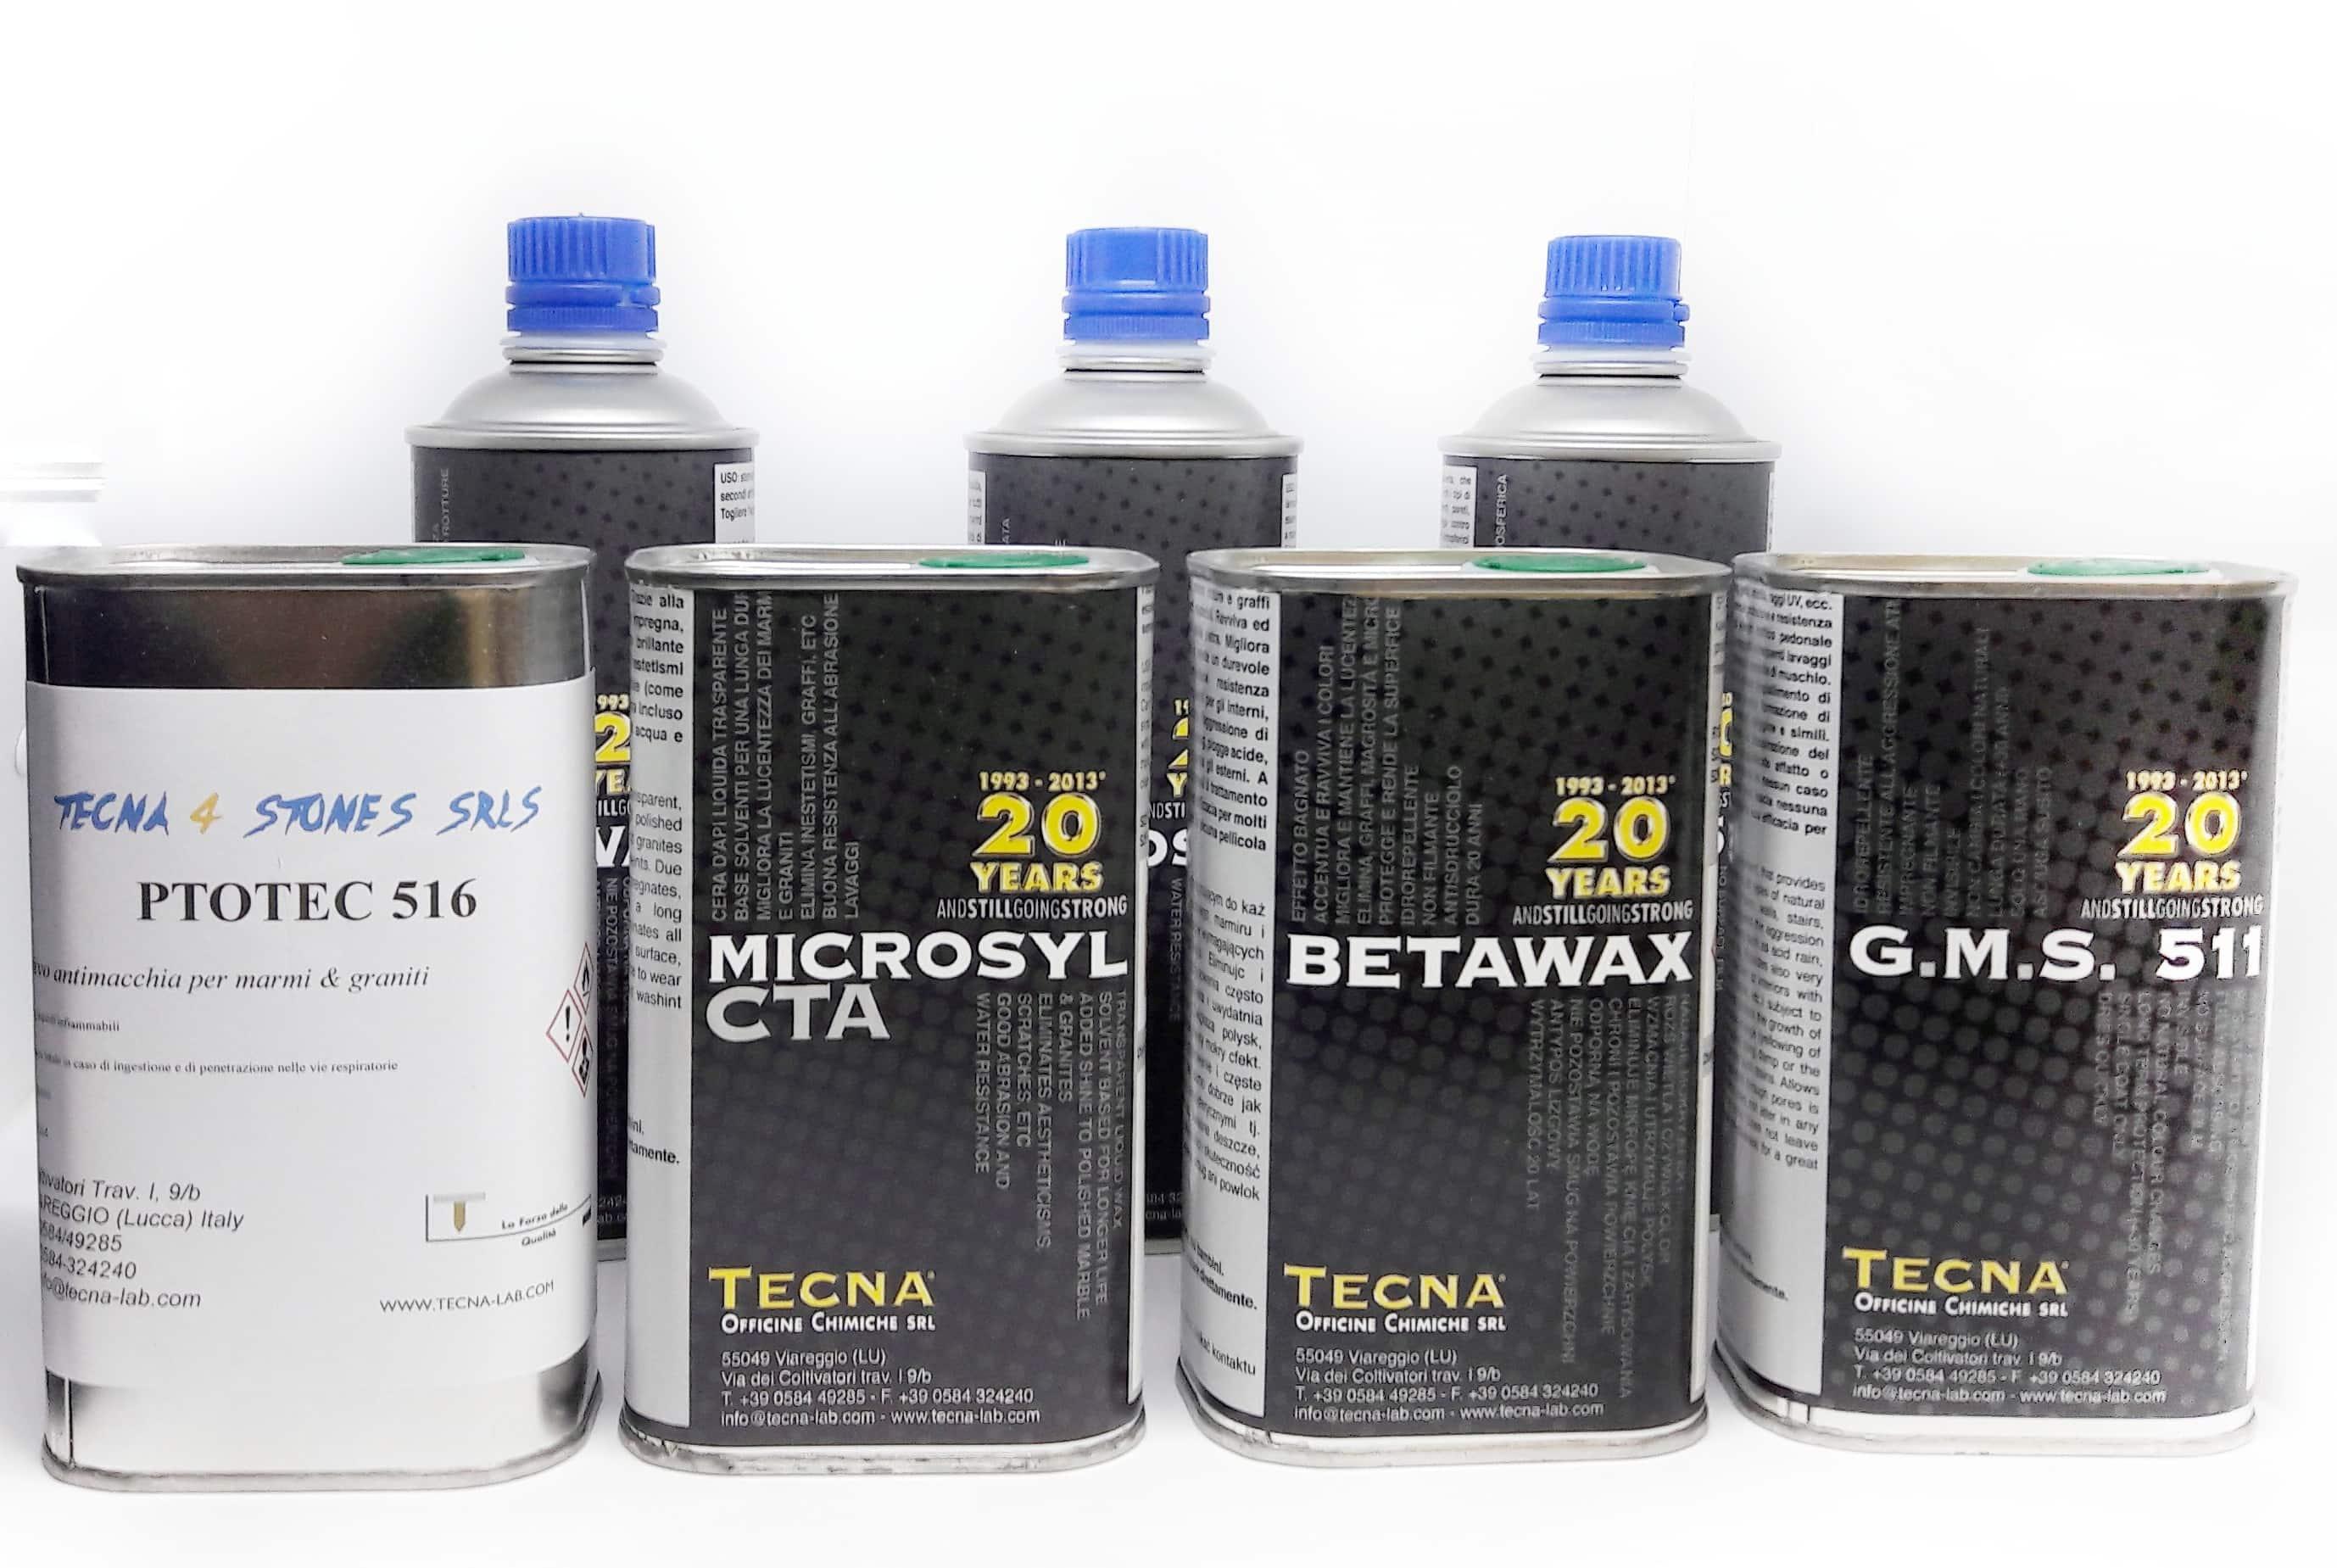 impregnaty TECNA, BETAWAX, PROTEC 516, GMS 511, MICROSYL